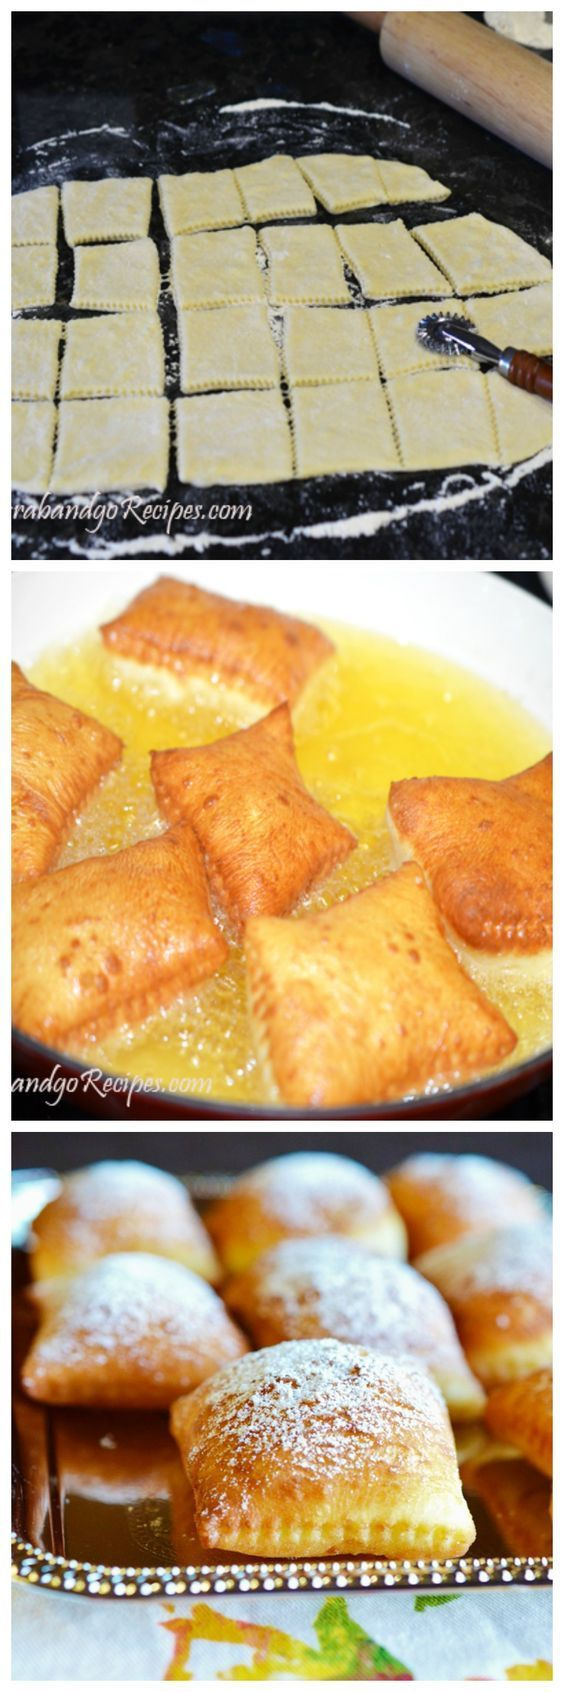 Puffy Beignets - Ponchiki Recipe